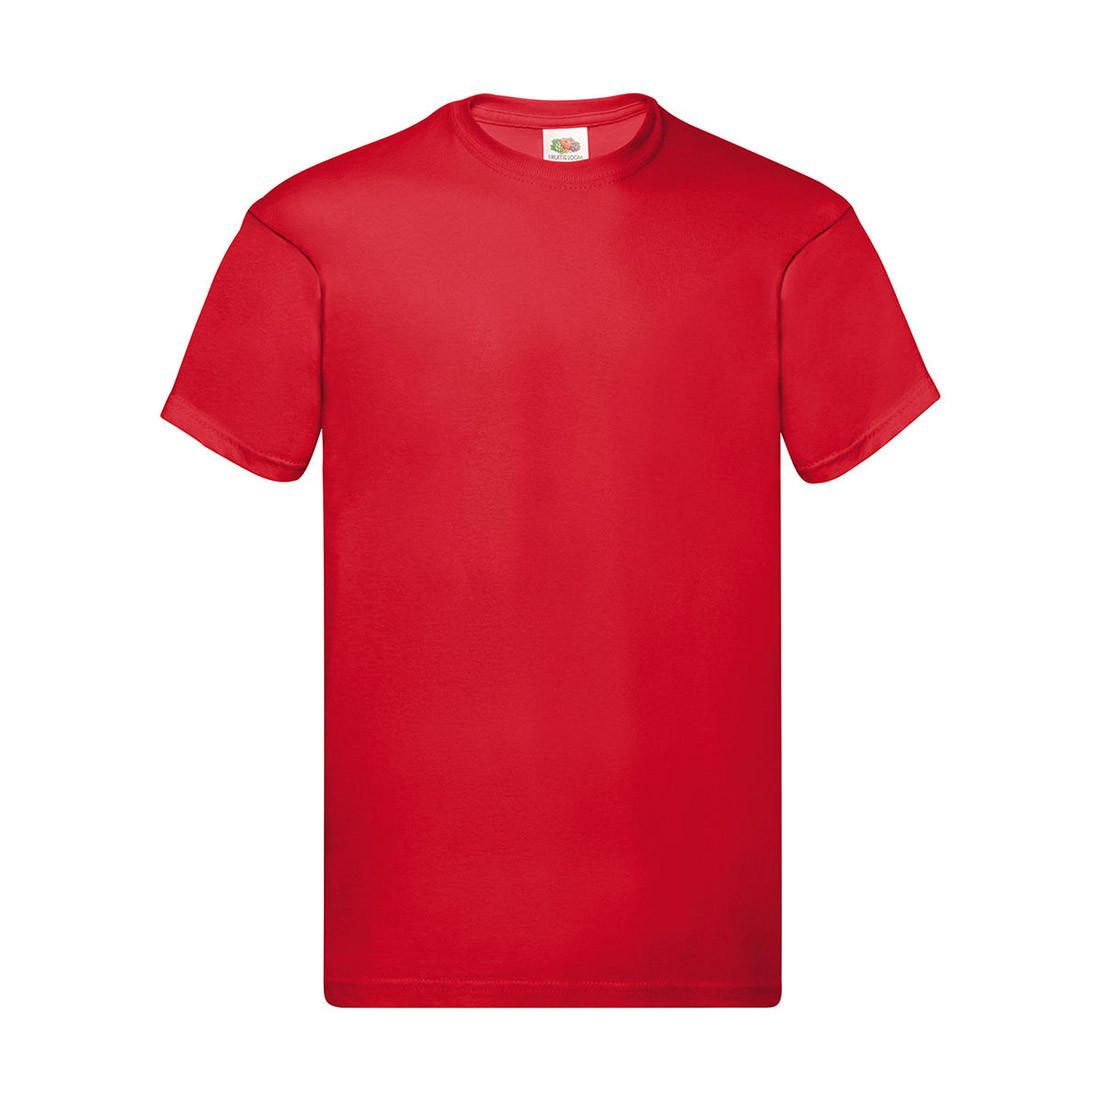 Tricou Original Full Cut Tee - Imbracaminte de protectie